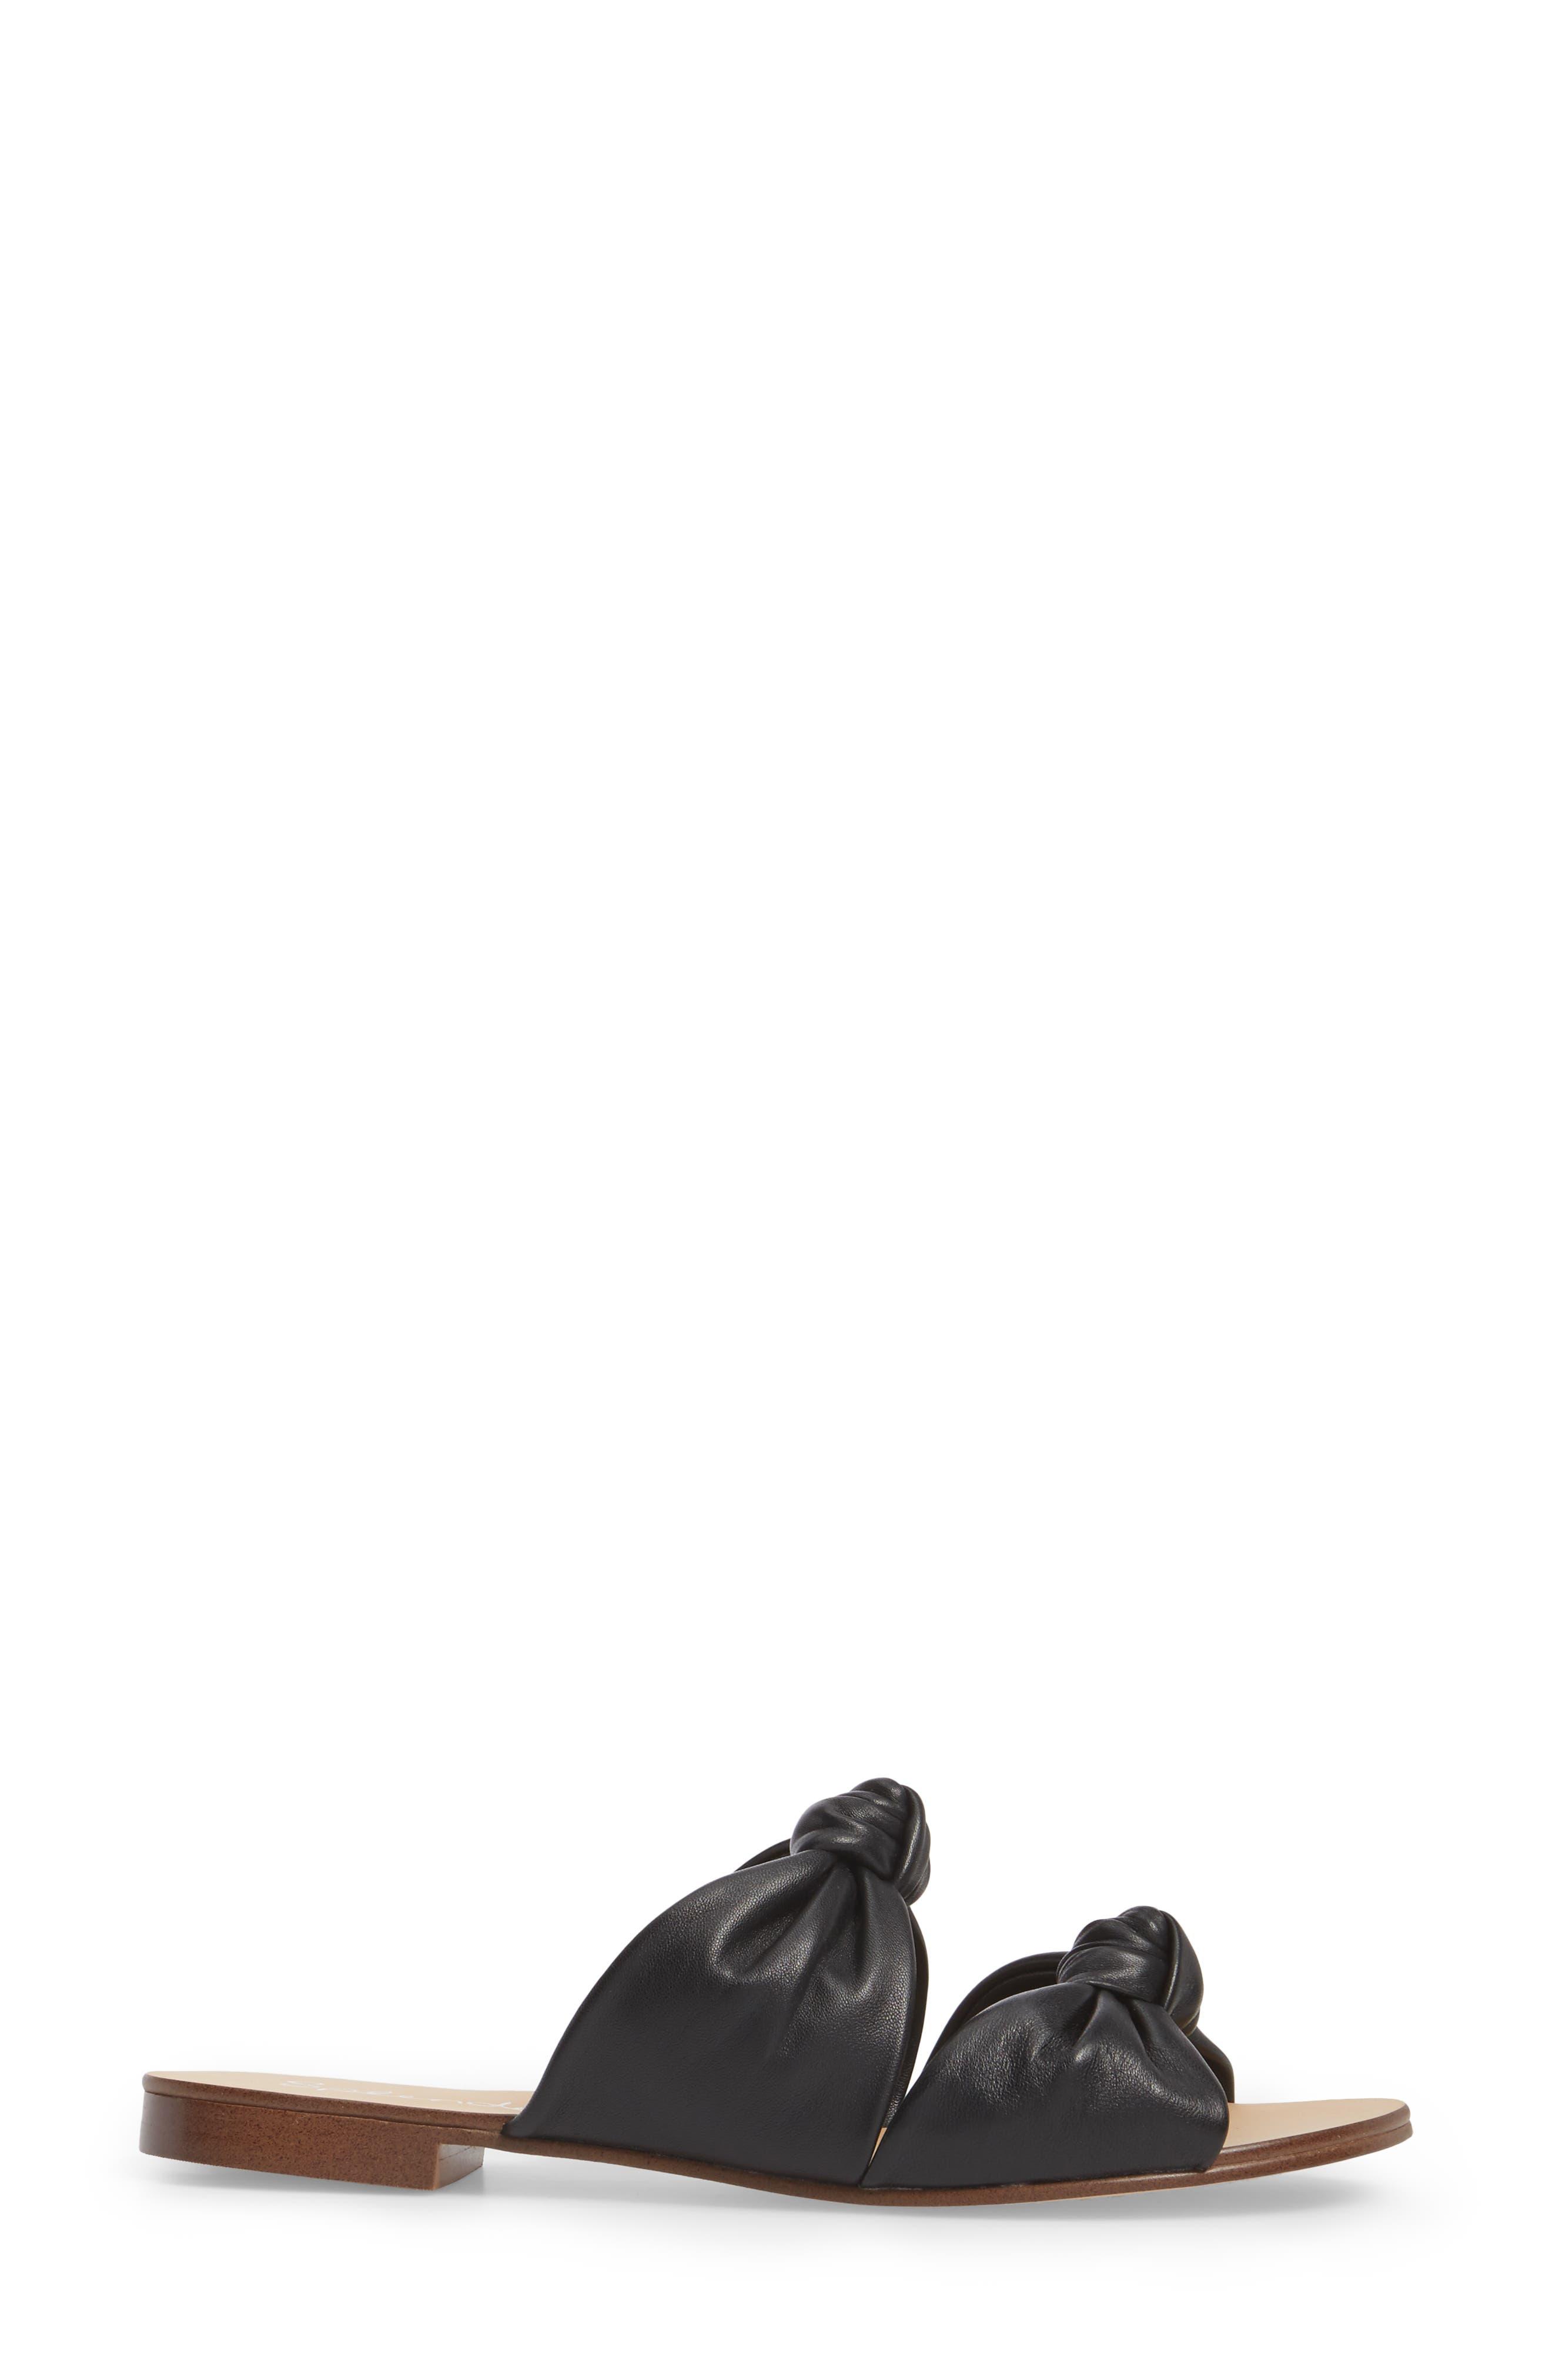 Barton Double Knotted Slide Sandal,                             Alternate thumbnail 3, color,                             BLACK LEATHER